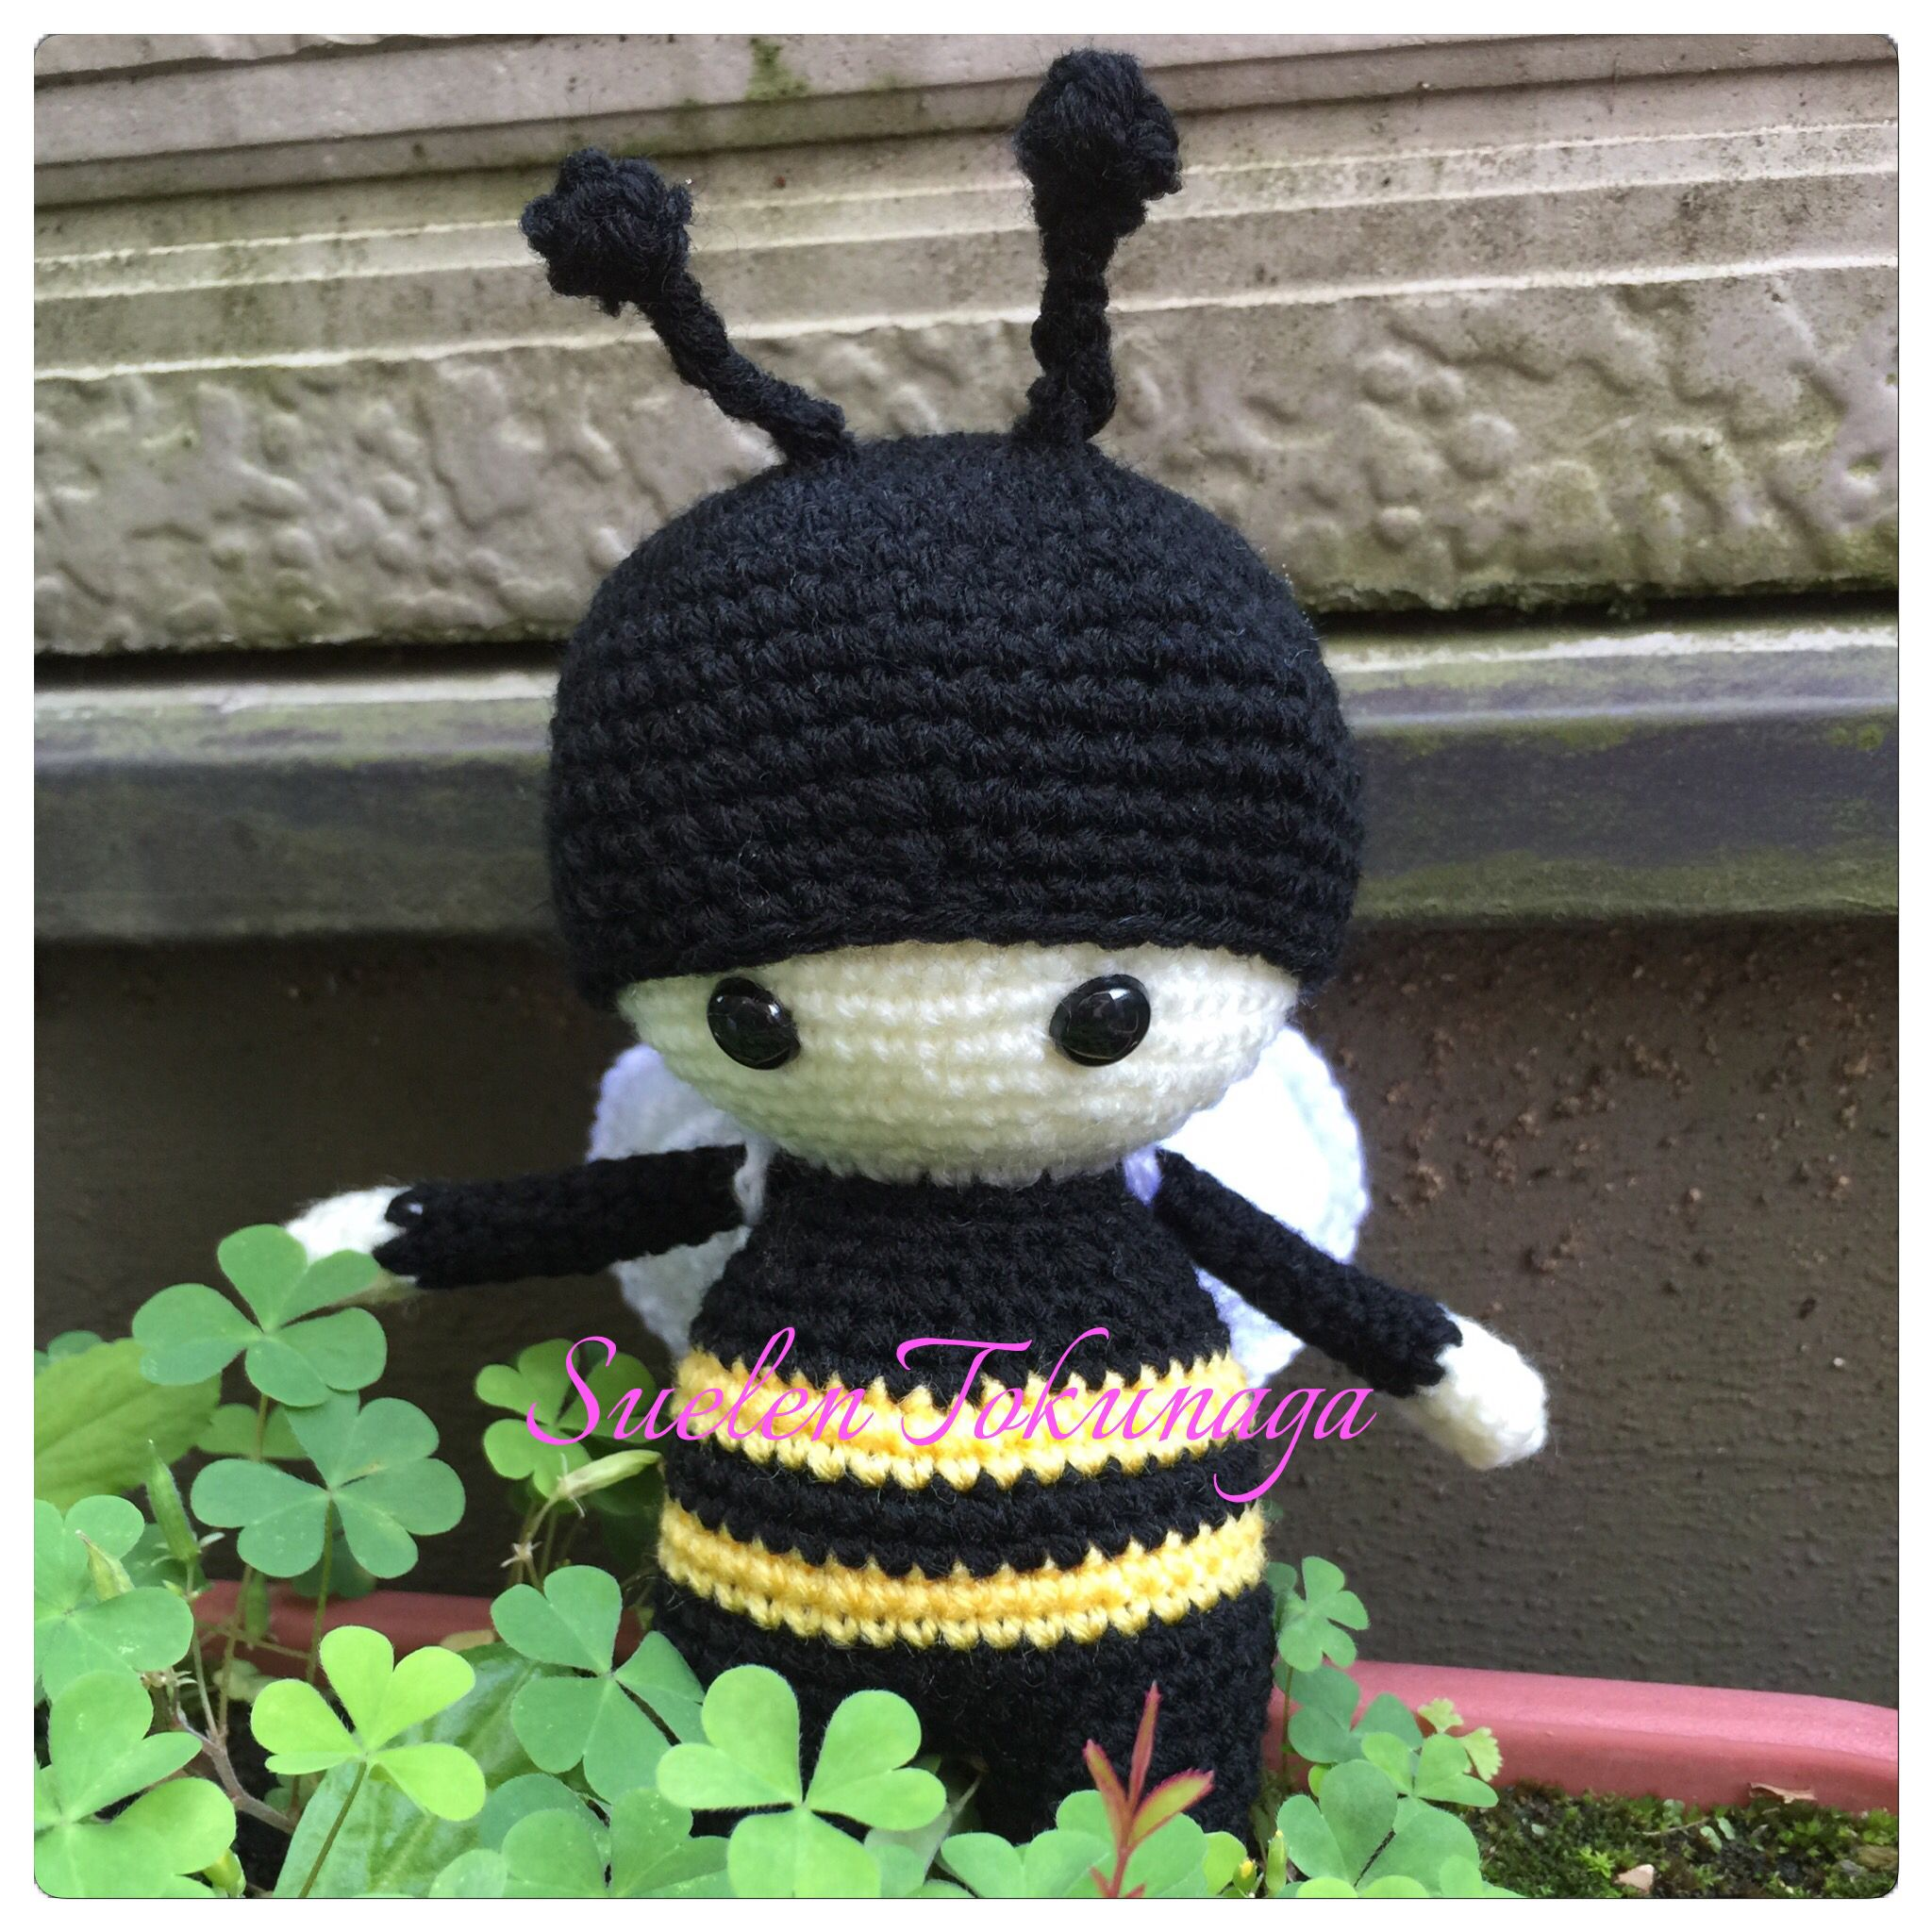 Bee 🐝 #amigurumi #crochet #crochê #handmade #handcraft #feitoamão